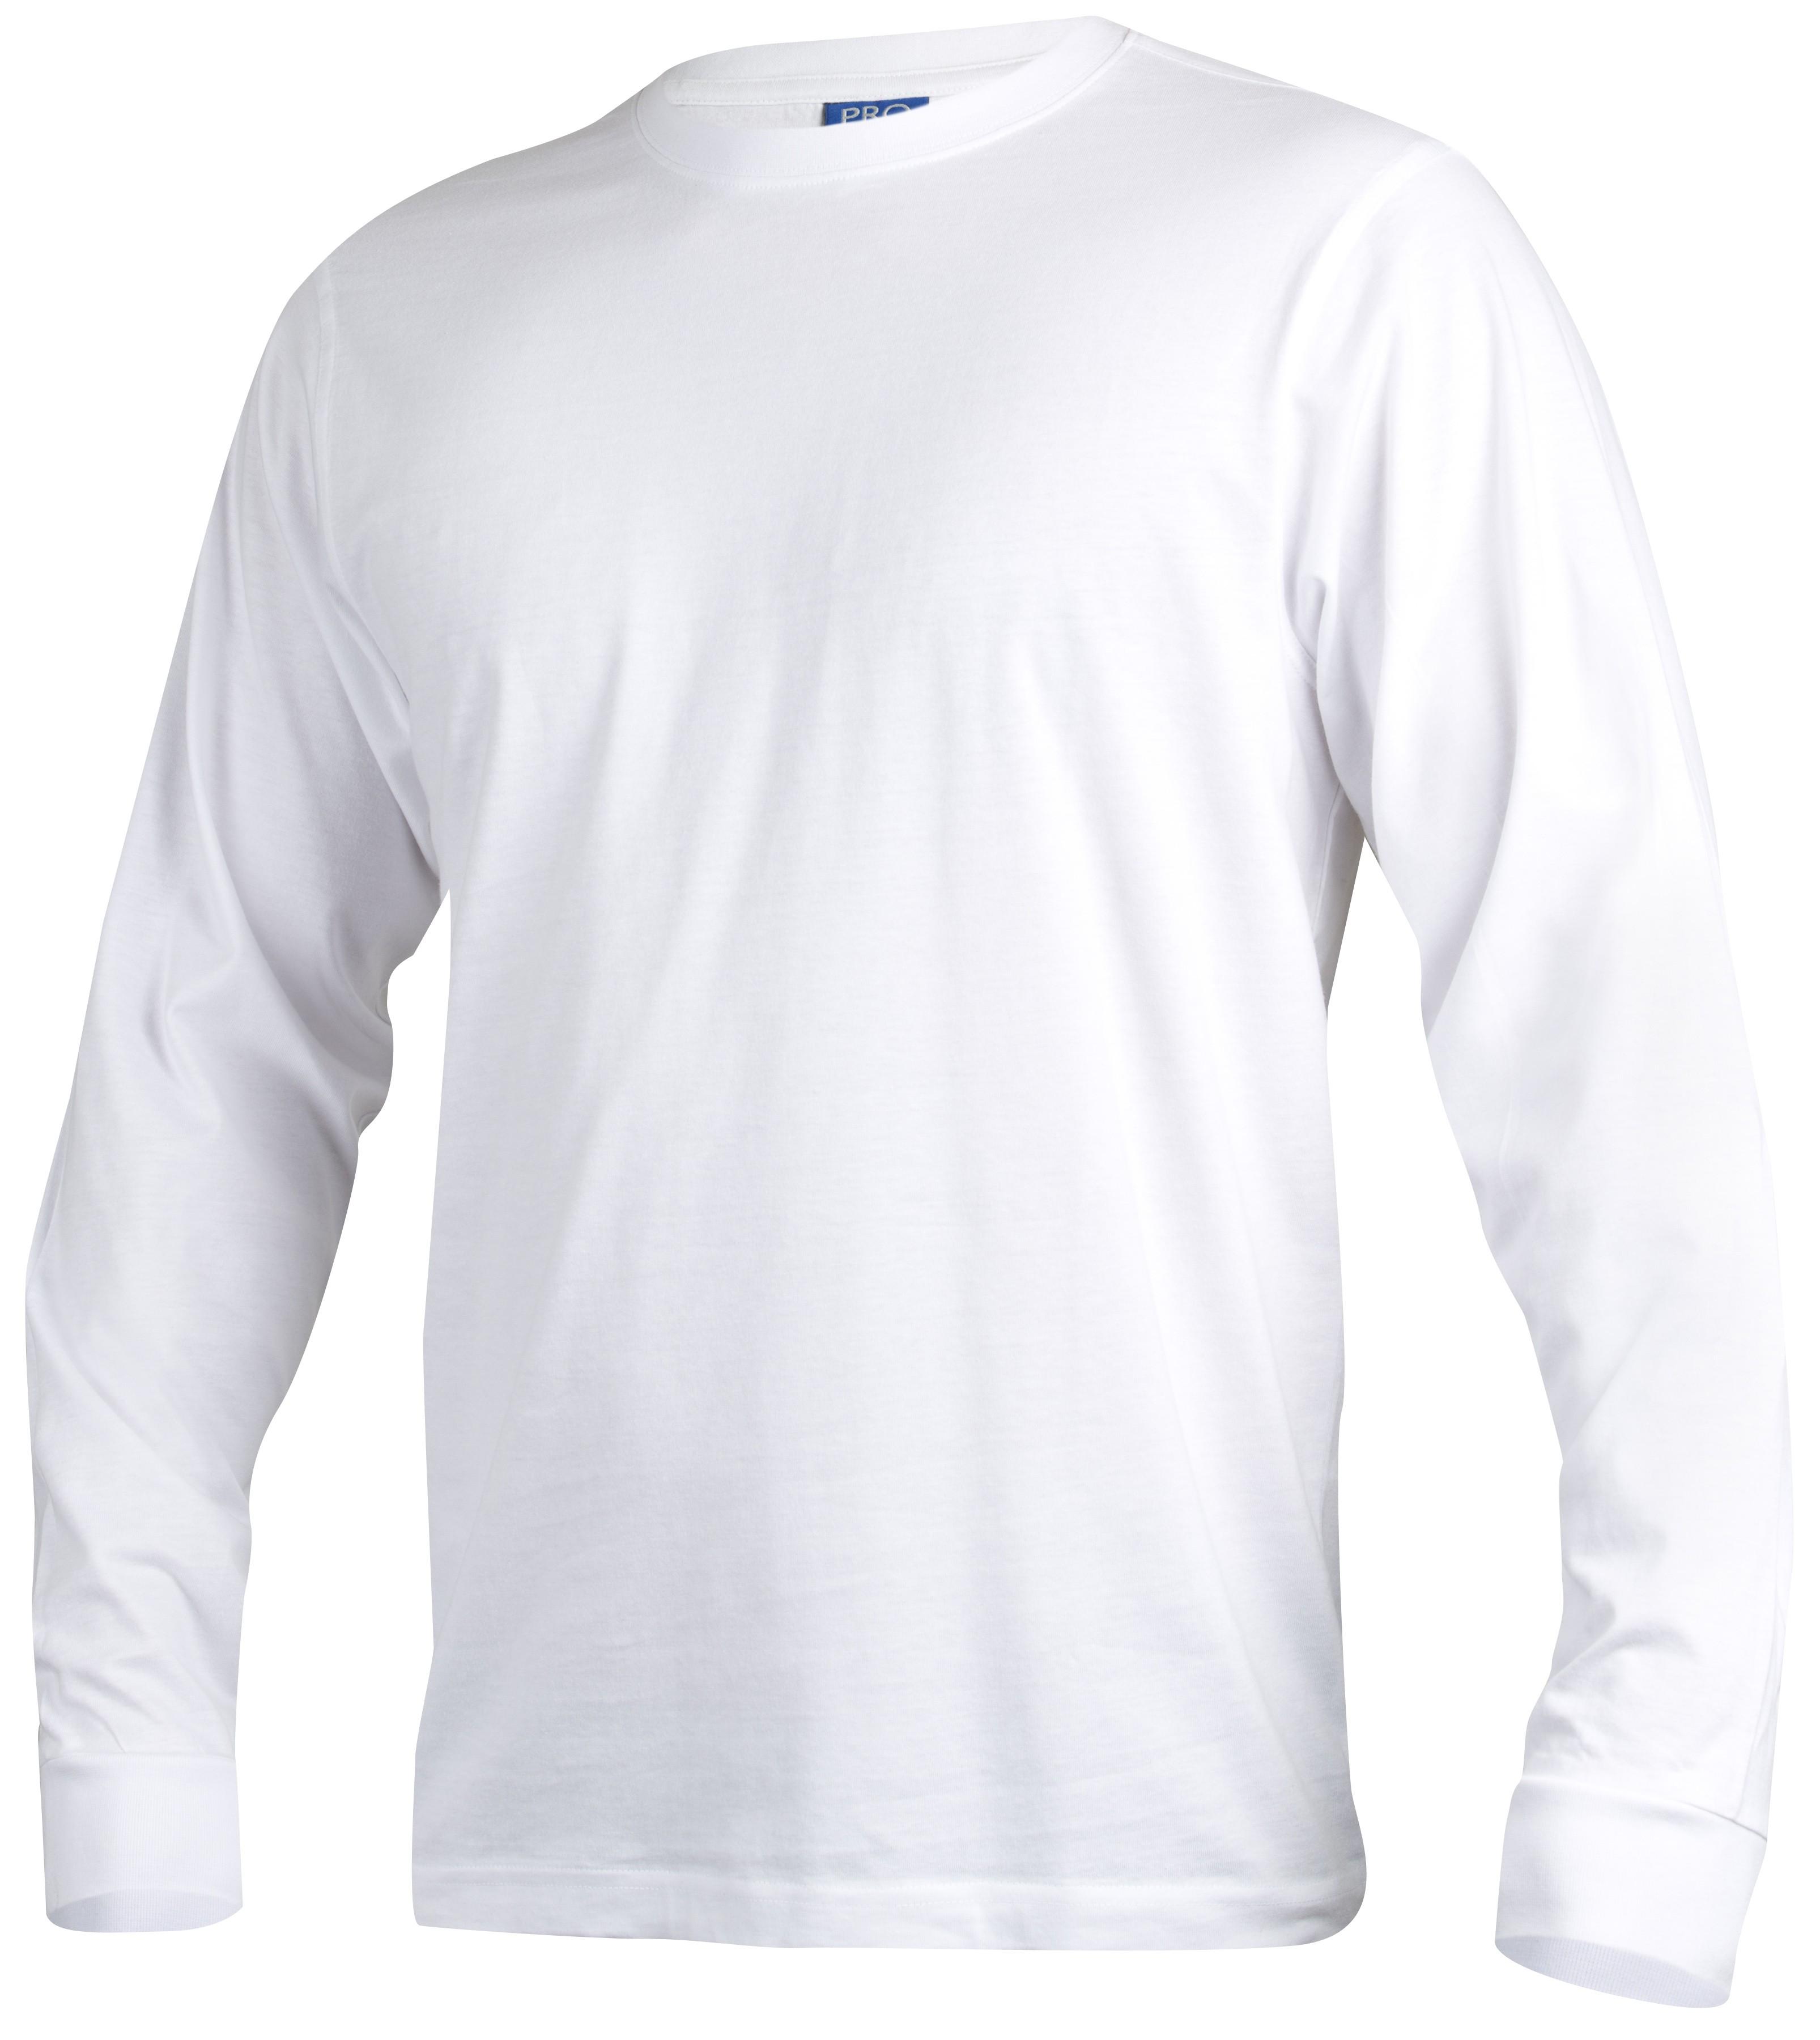 2017 Long-sleeved T-shirt